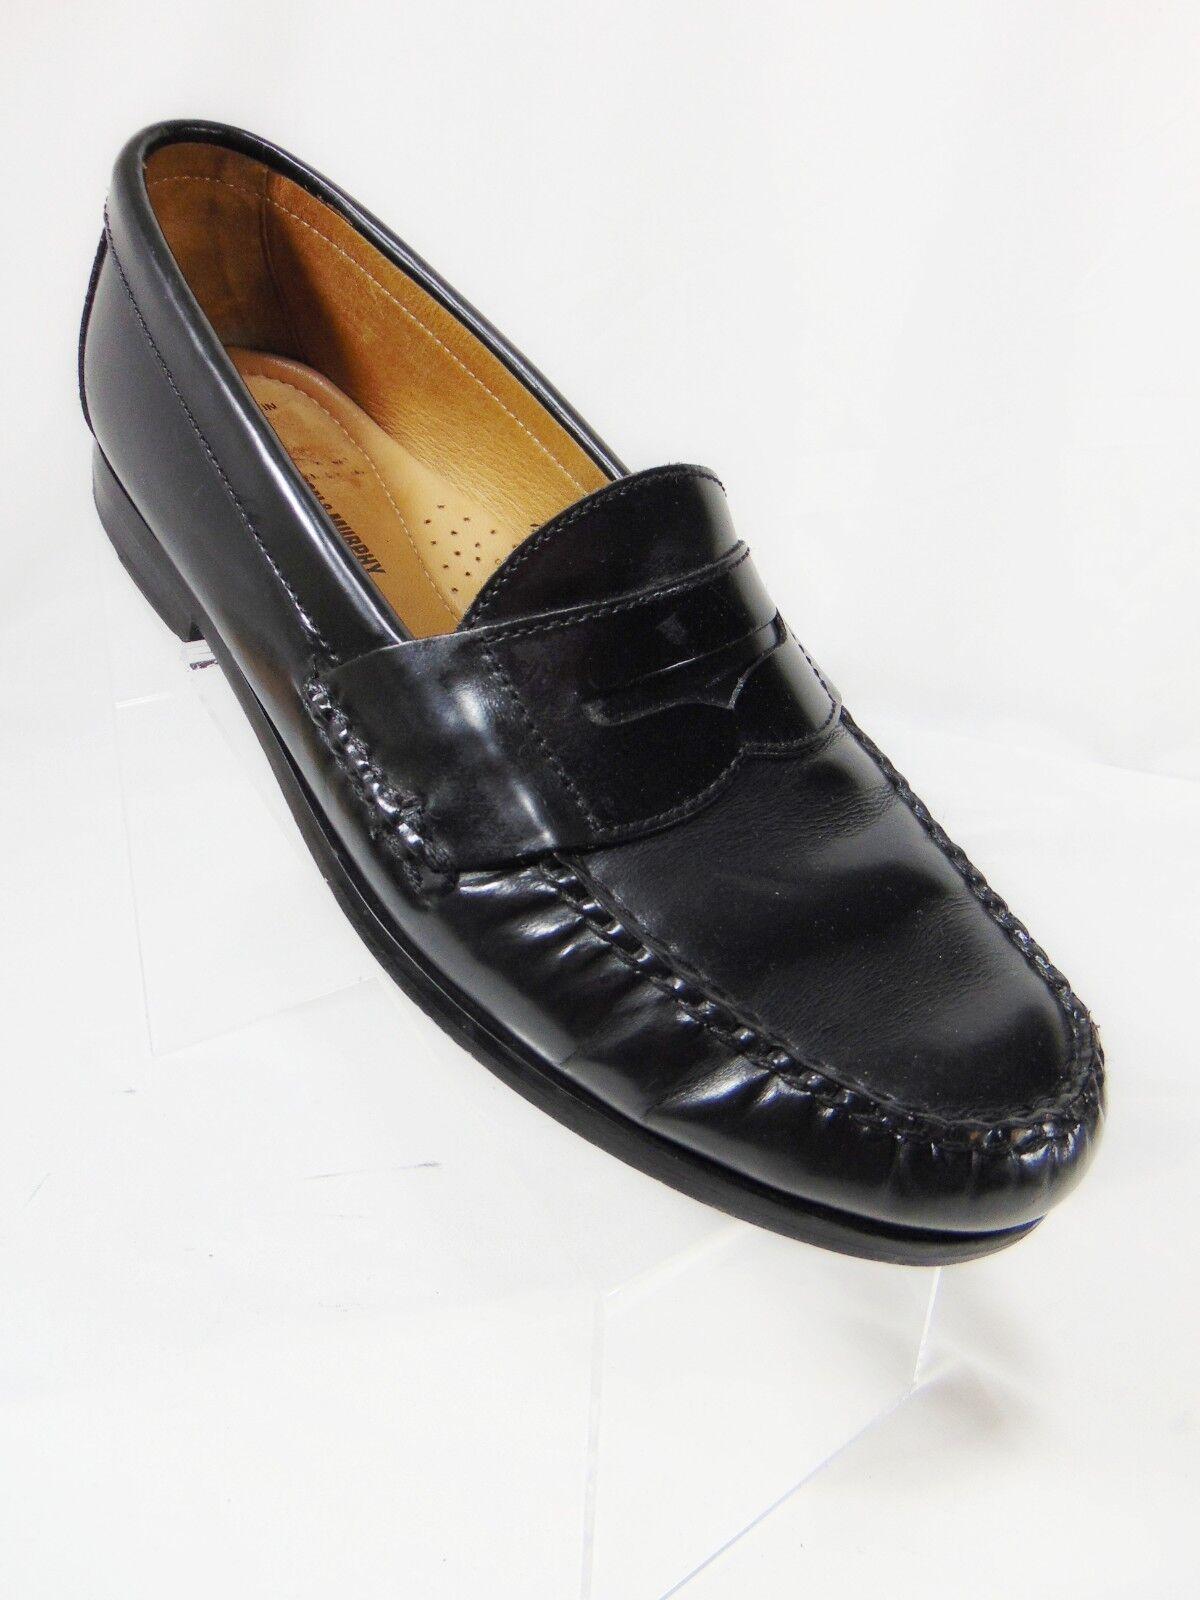 JOHNSTON & MURPHY Men's Penny Loafer Style shoes 10.5 M Black Leather  Sheepskin